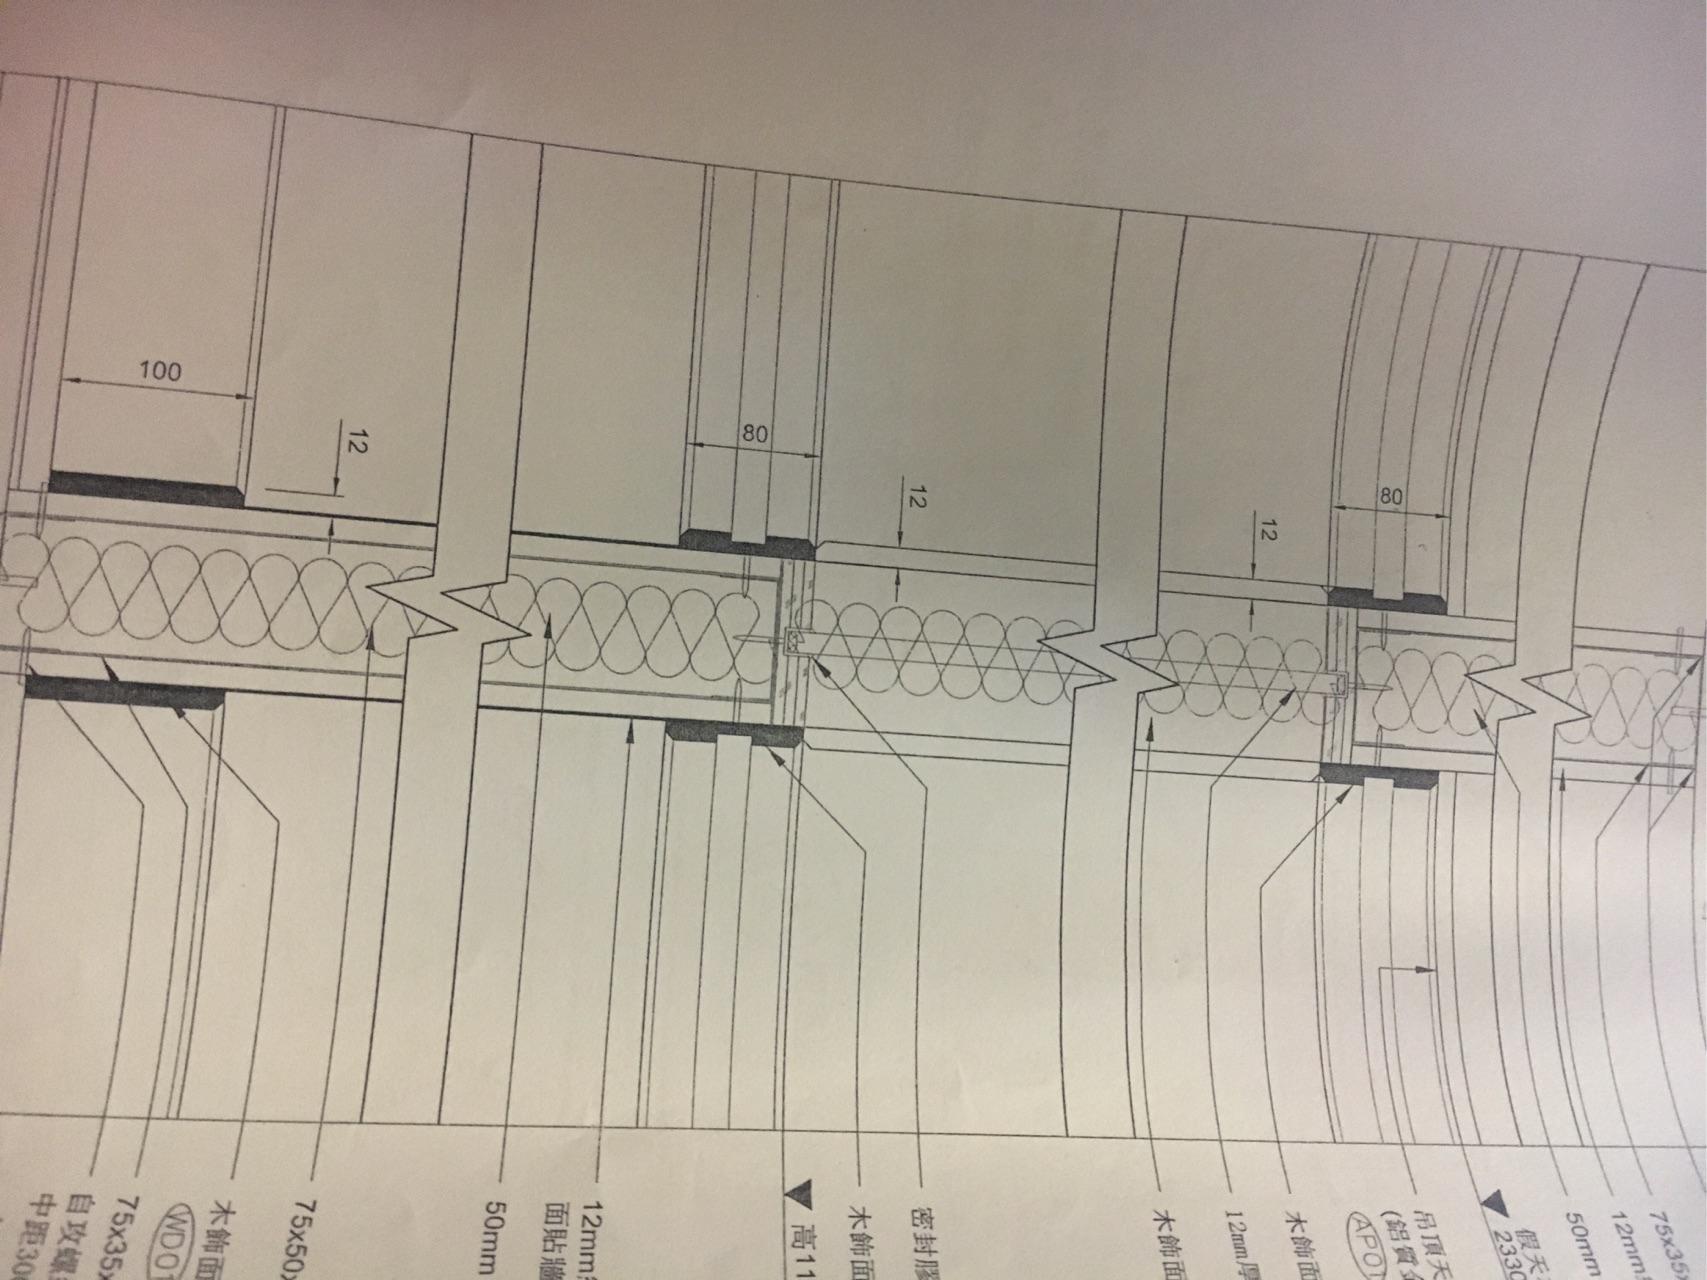 v码头设计图码头上的趸船填充物在cad中放大而曲线图纸图纸图片